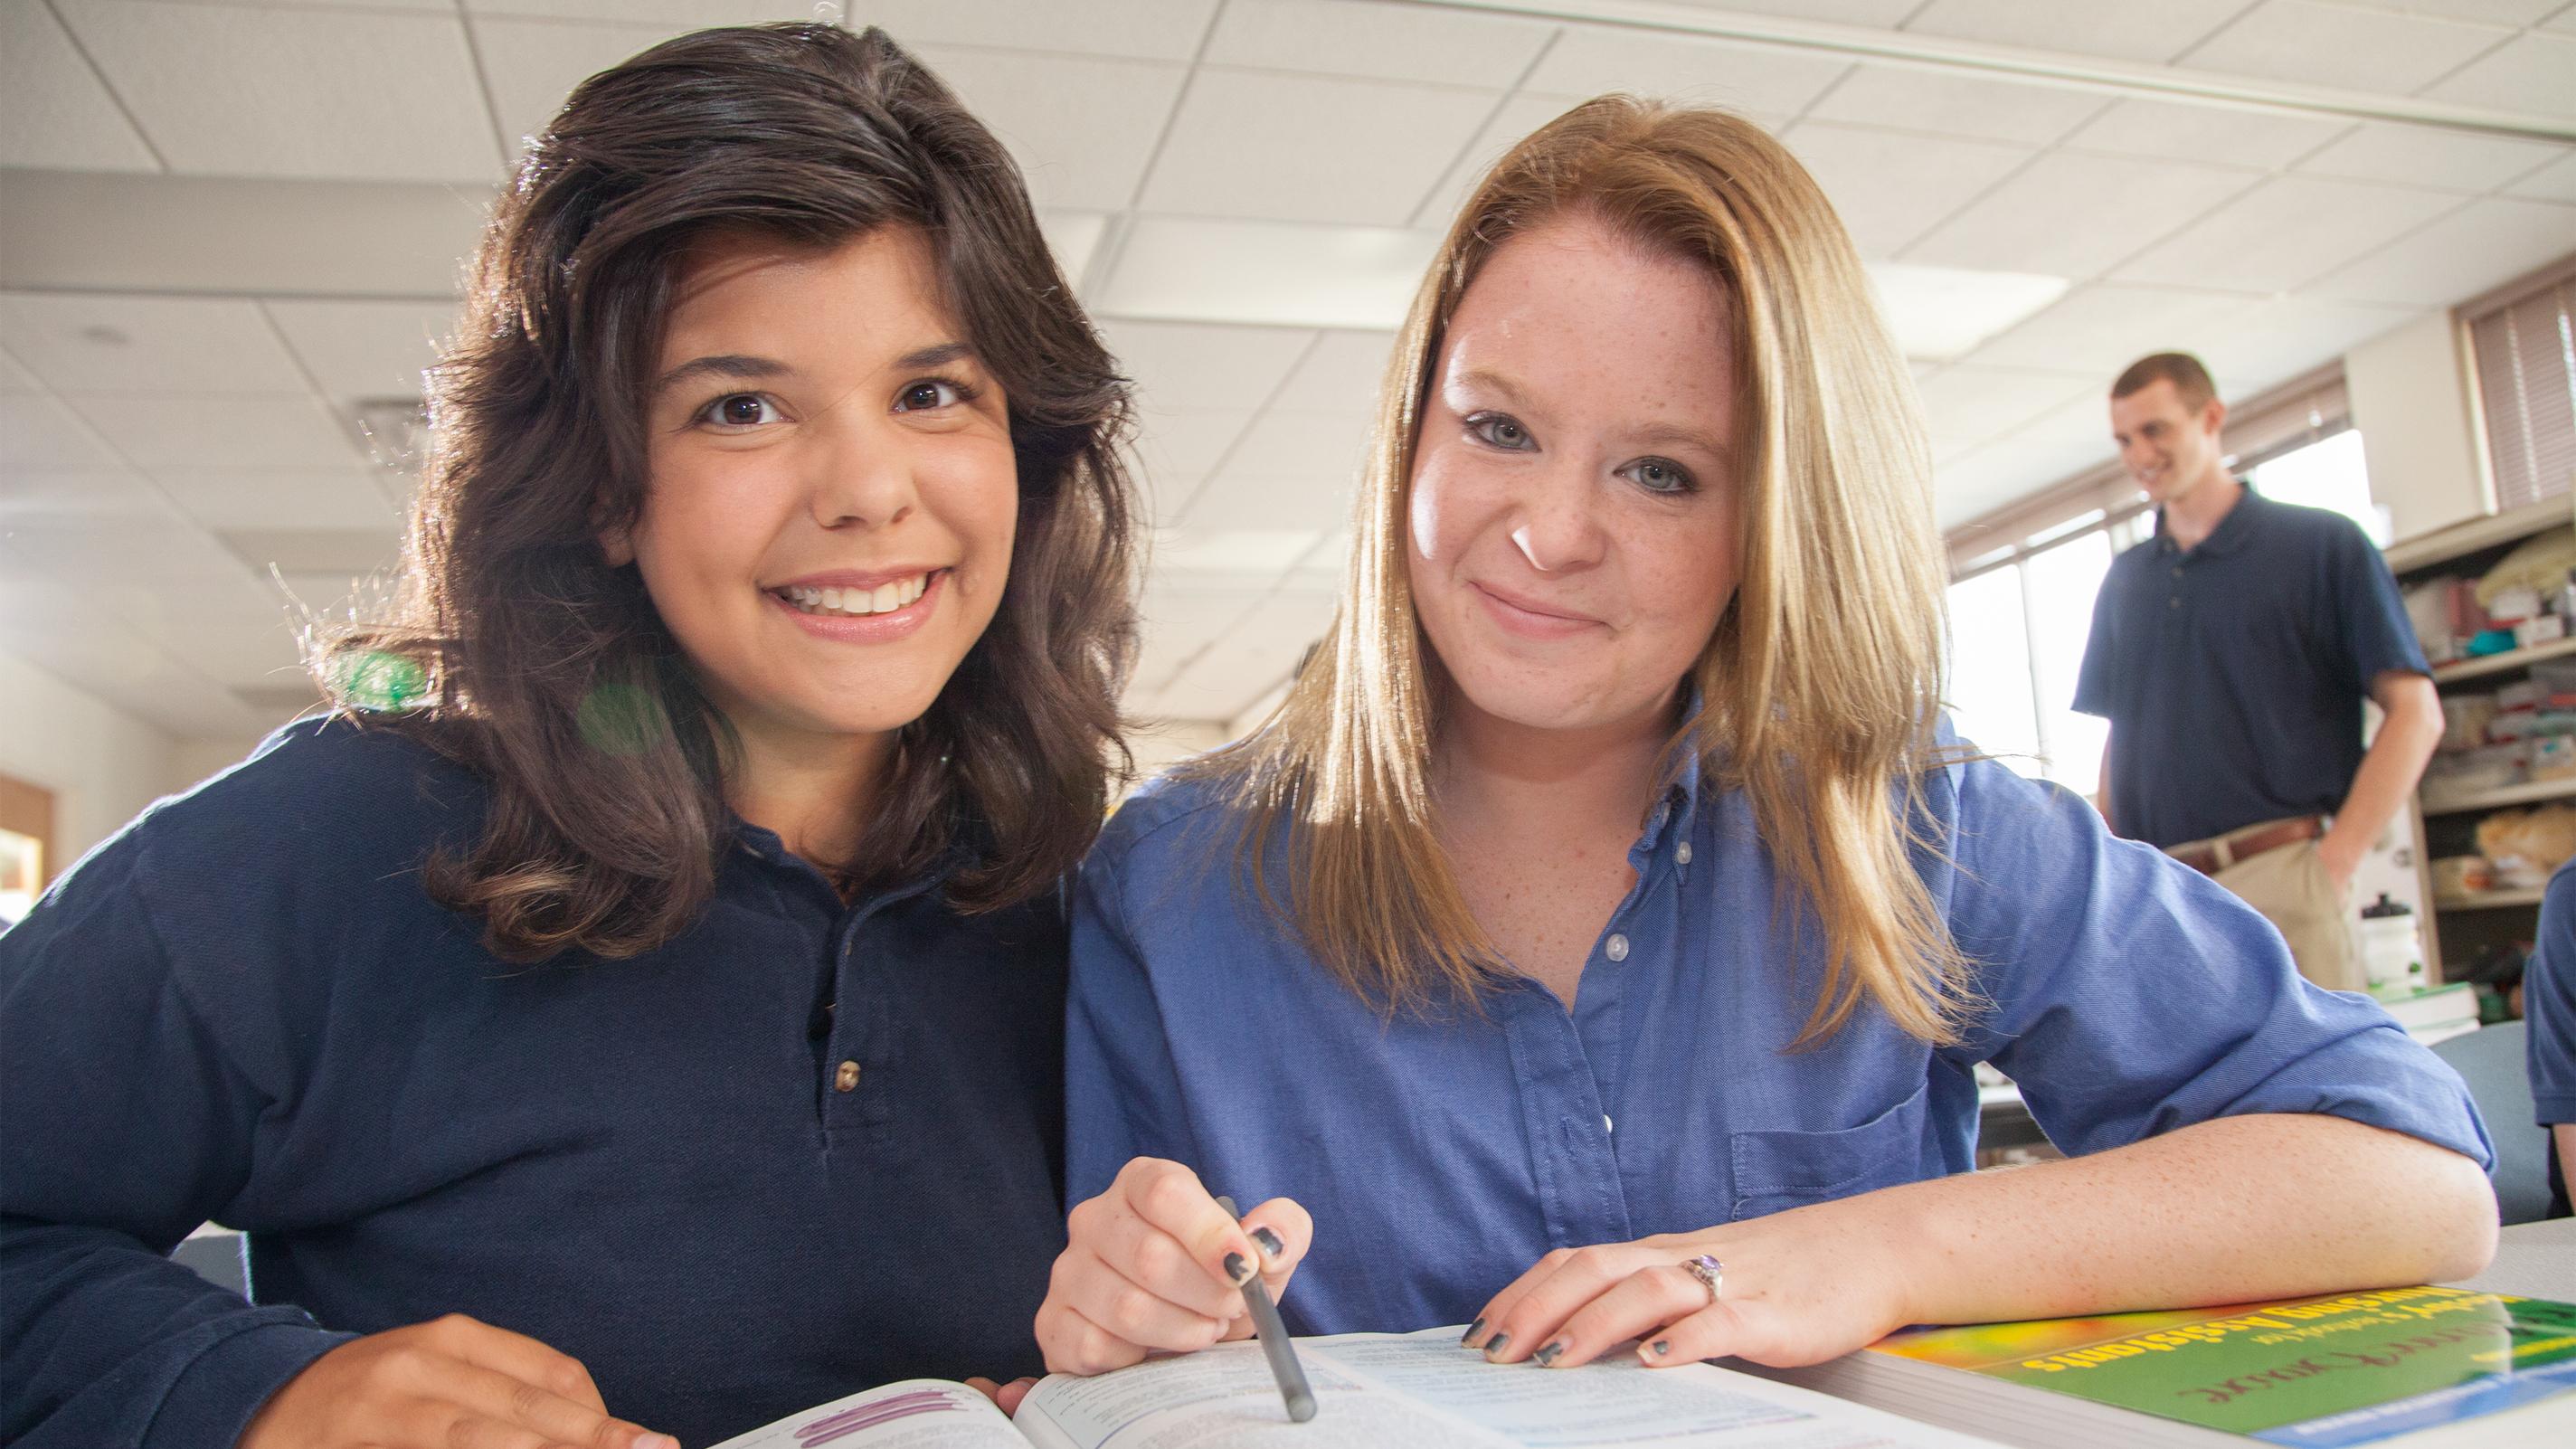 Job Corps student studying together